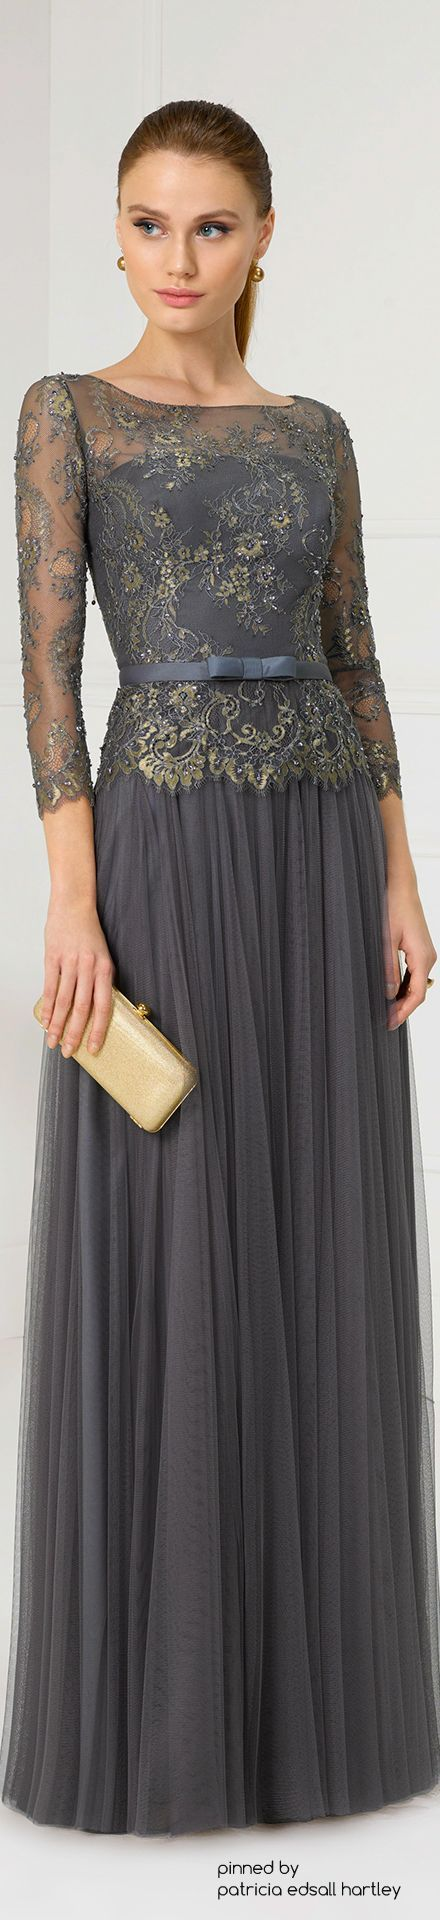 @roressclothes clothing ideas #women fashion gray maxi dress